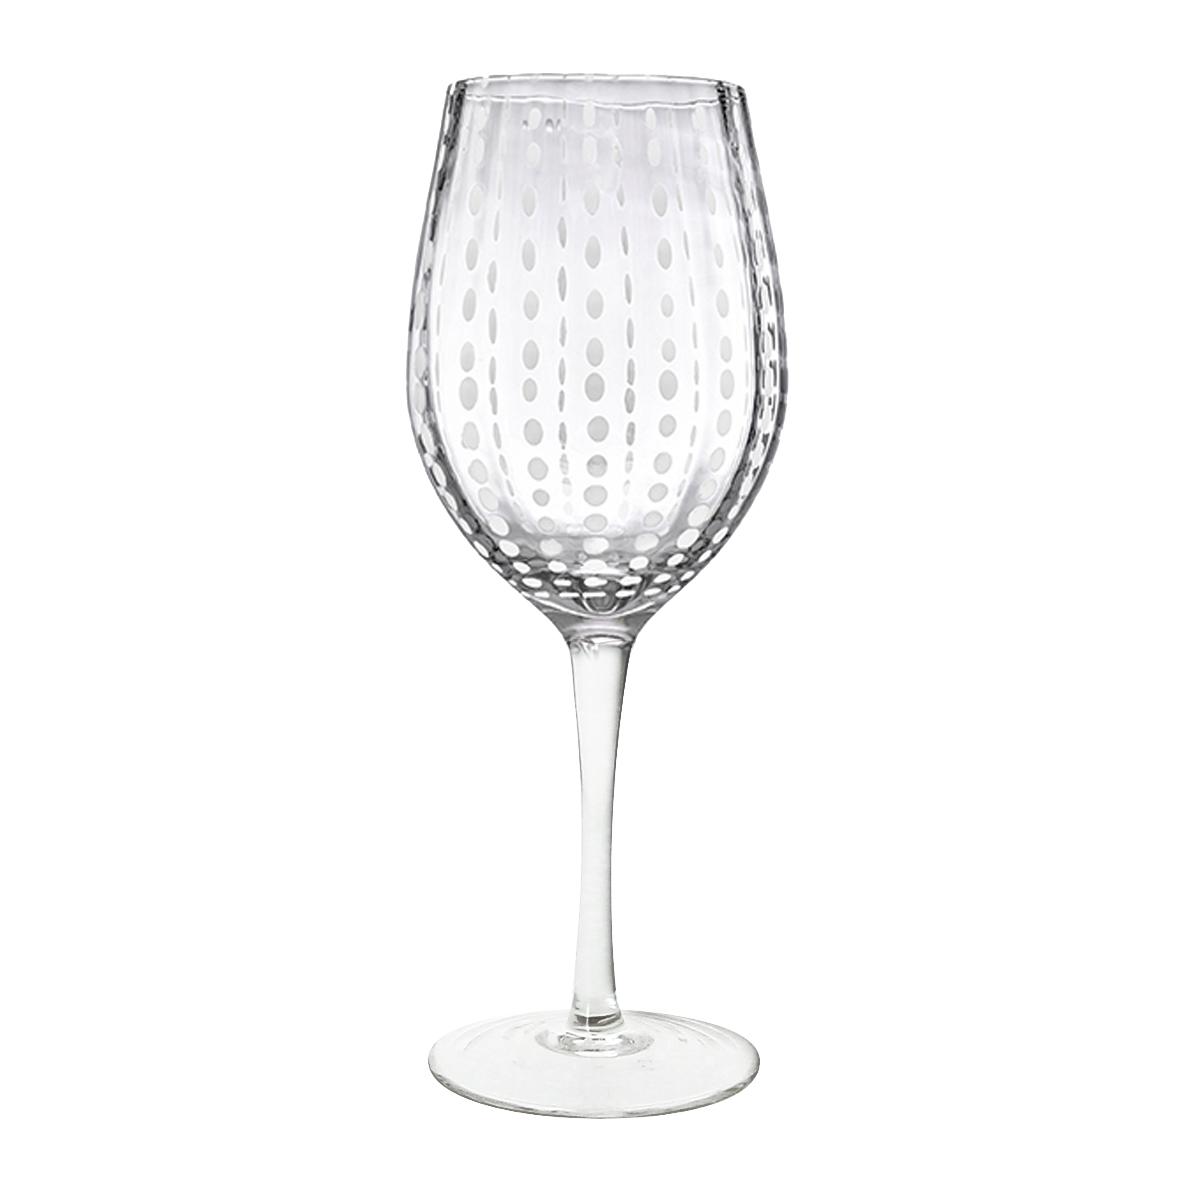 Verre à vin 40cl - CARNIVAL - Verres à vin taillés - Bruno Evrard d15019008c88